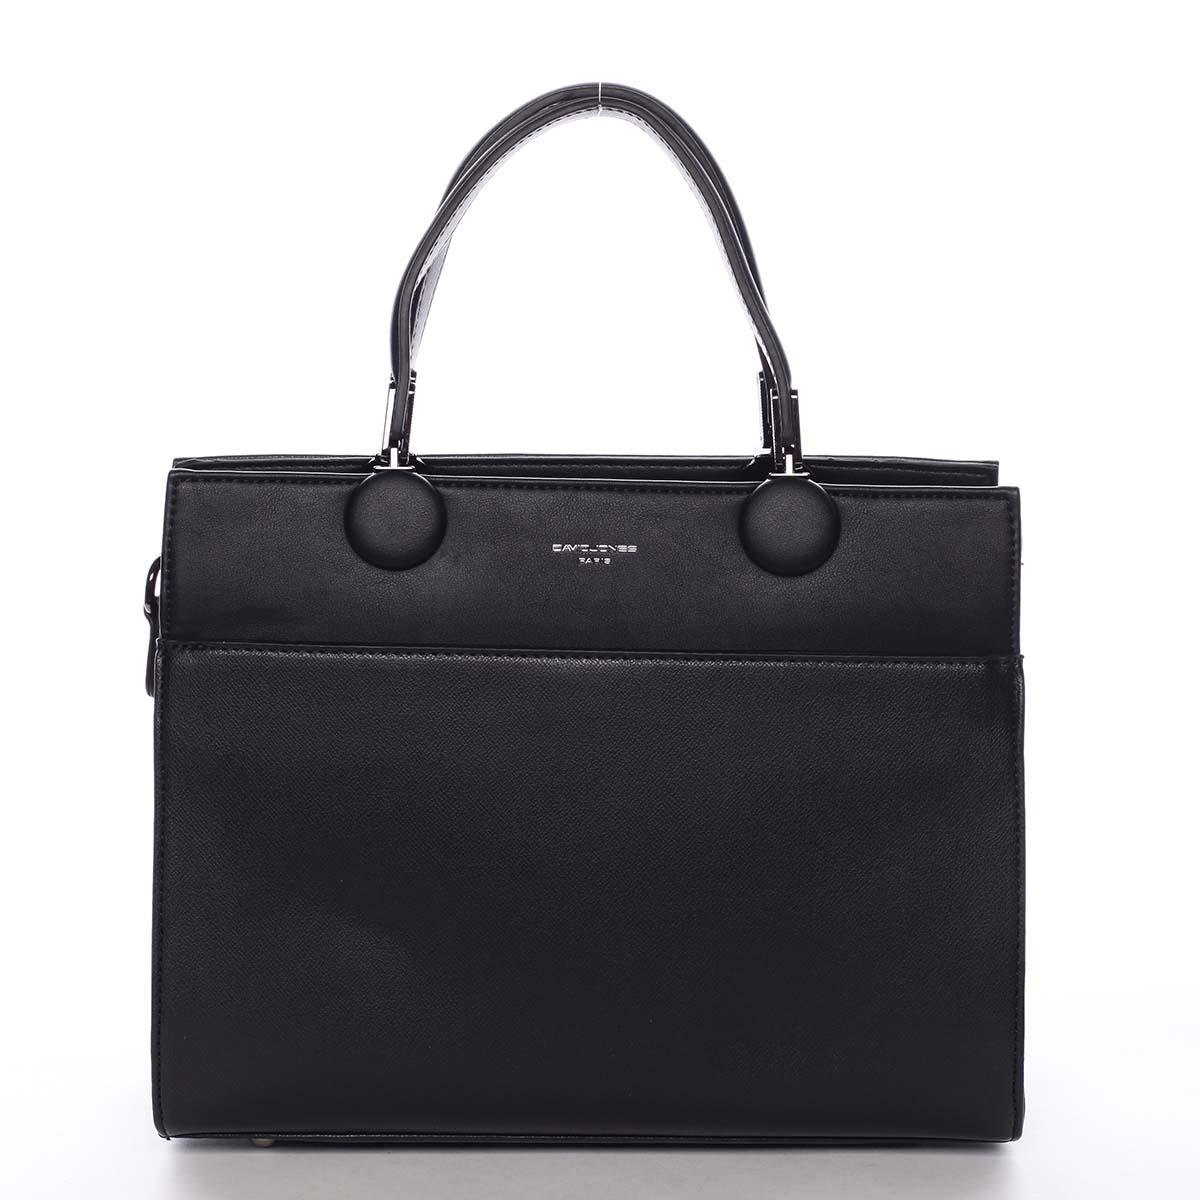 Dámska kabelka do ruky čierna - David Jones Edma